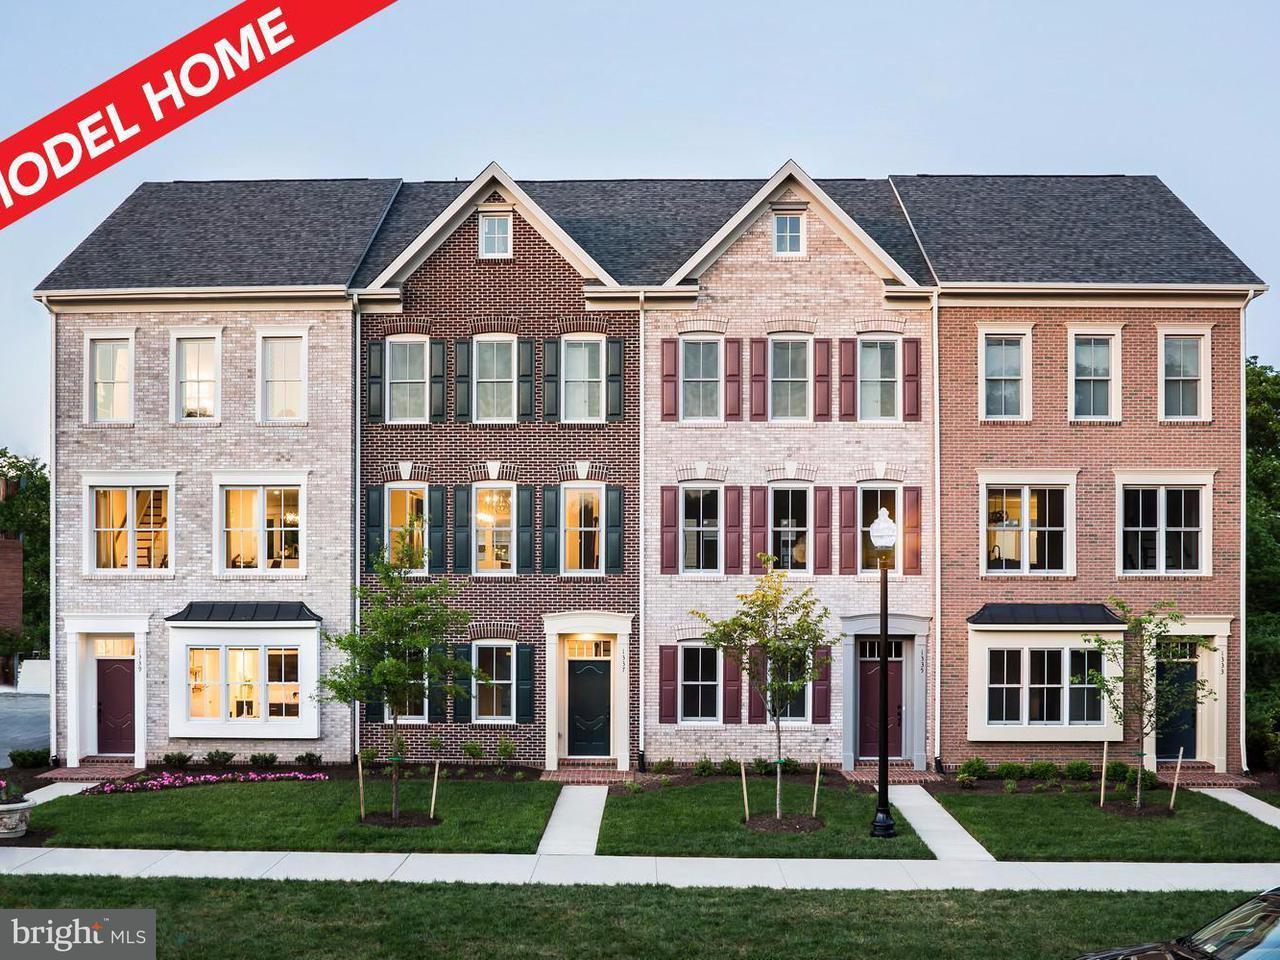 Single Family for Sale at 1361 Powhatan St Alexandria, Virginia 22314 United States